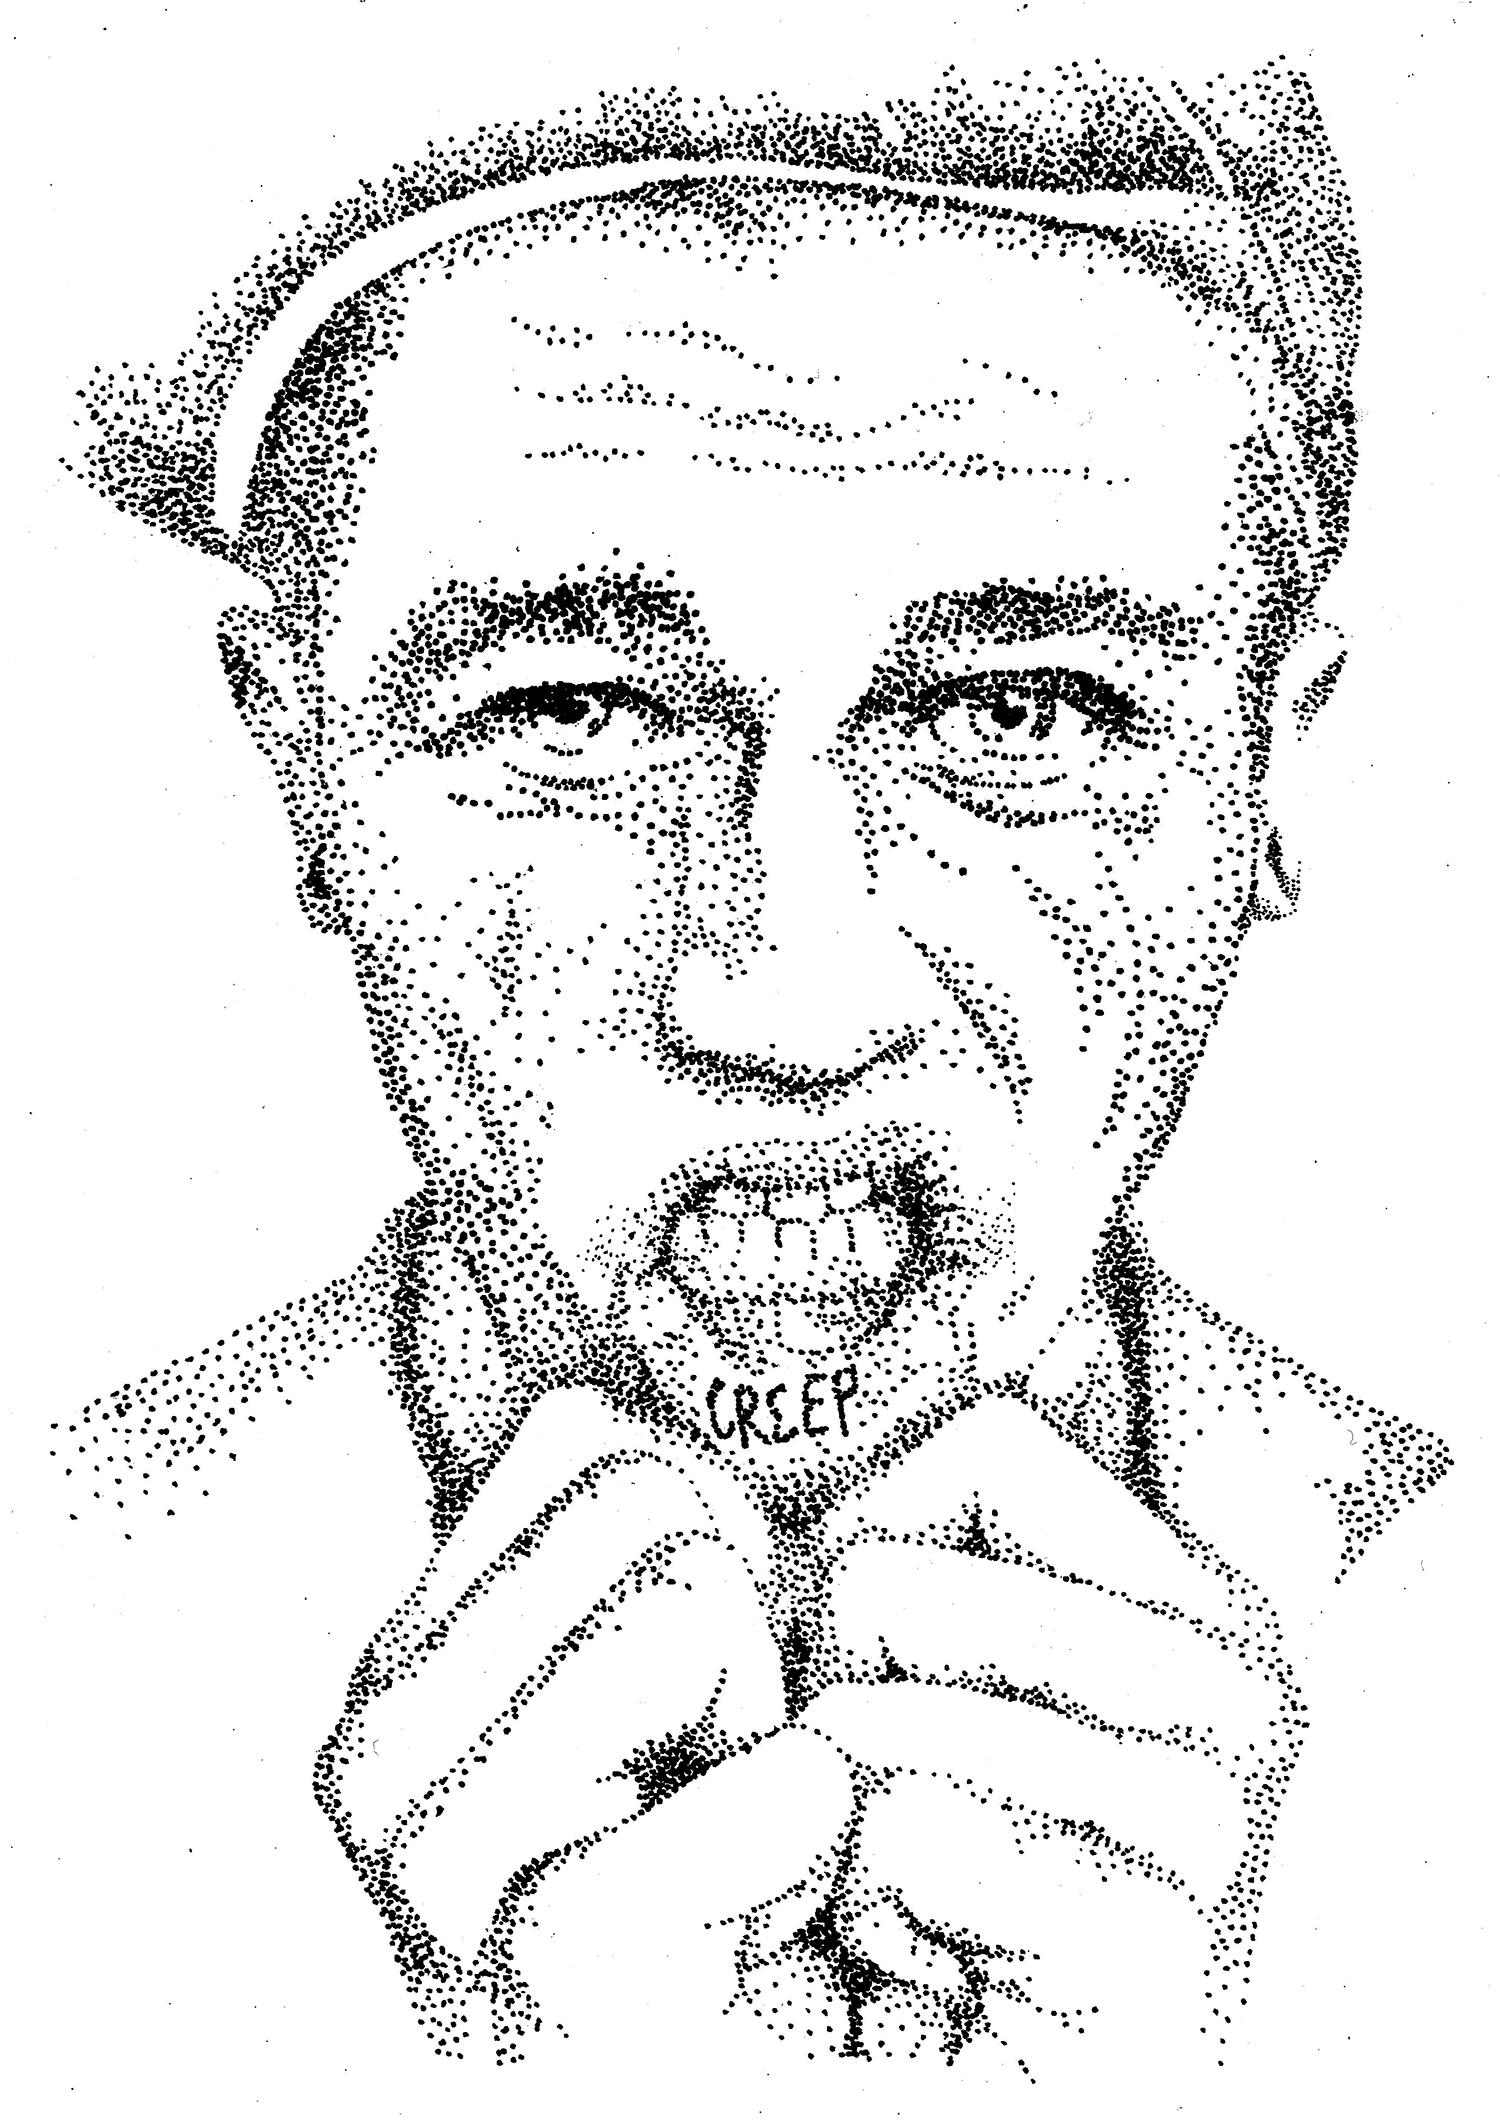 rbtq_Illustration_Seiser_Illustratorin_Hamburg_creep_dots.jpg